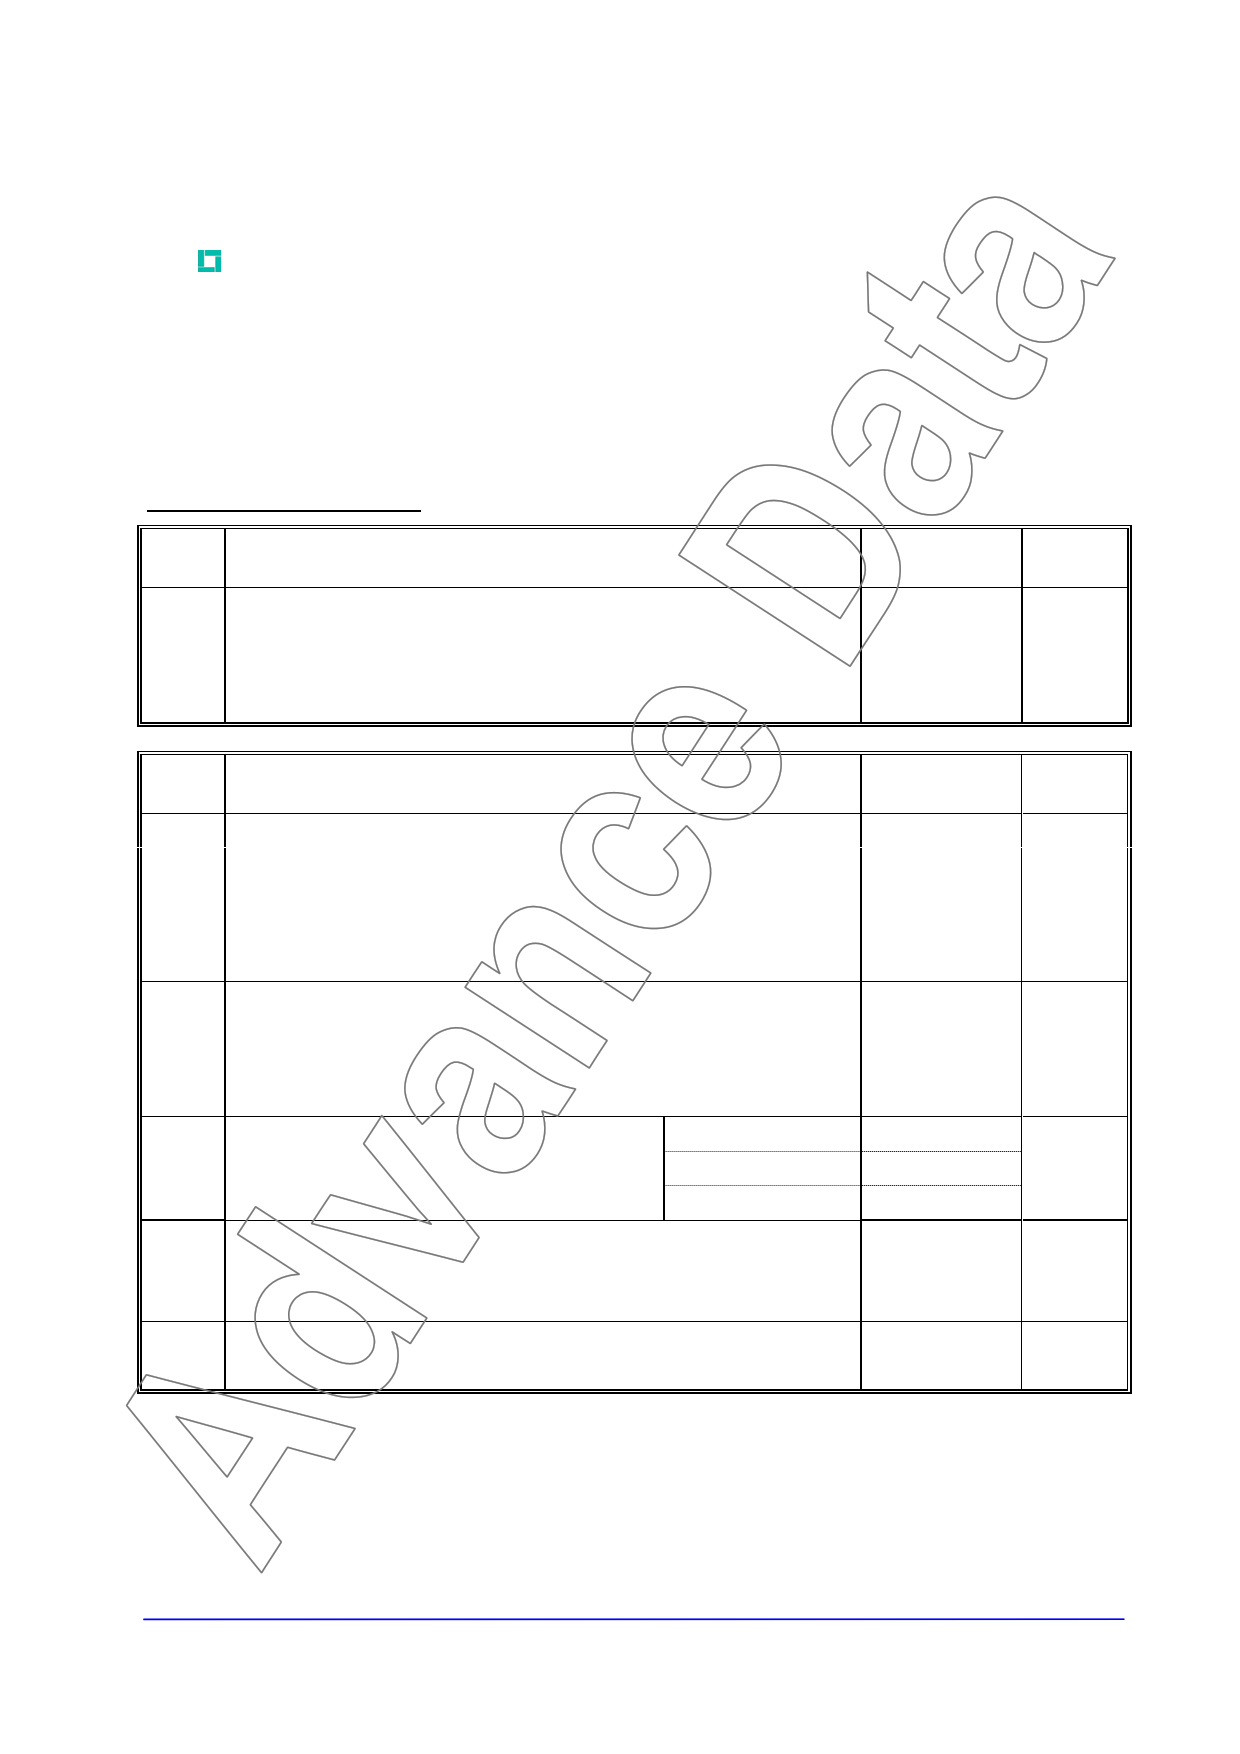 K0620QE640 datasheet